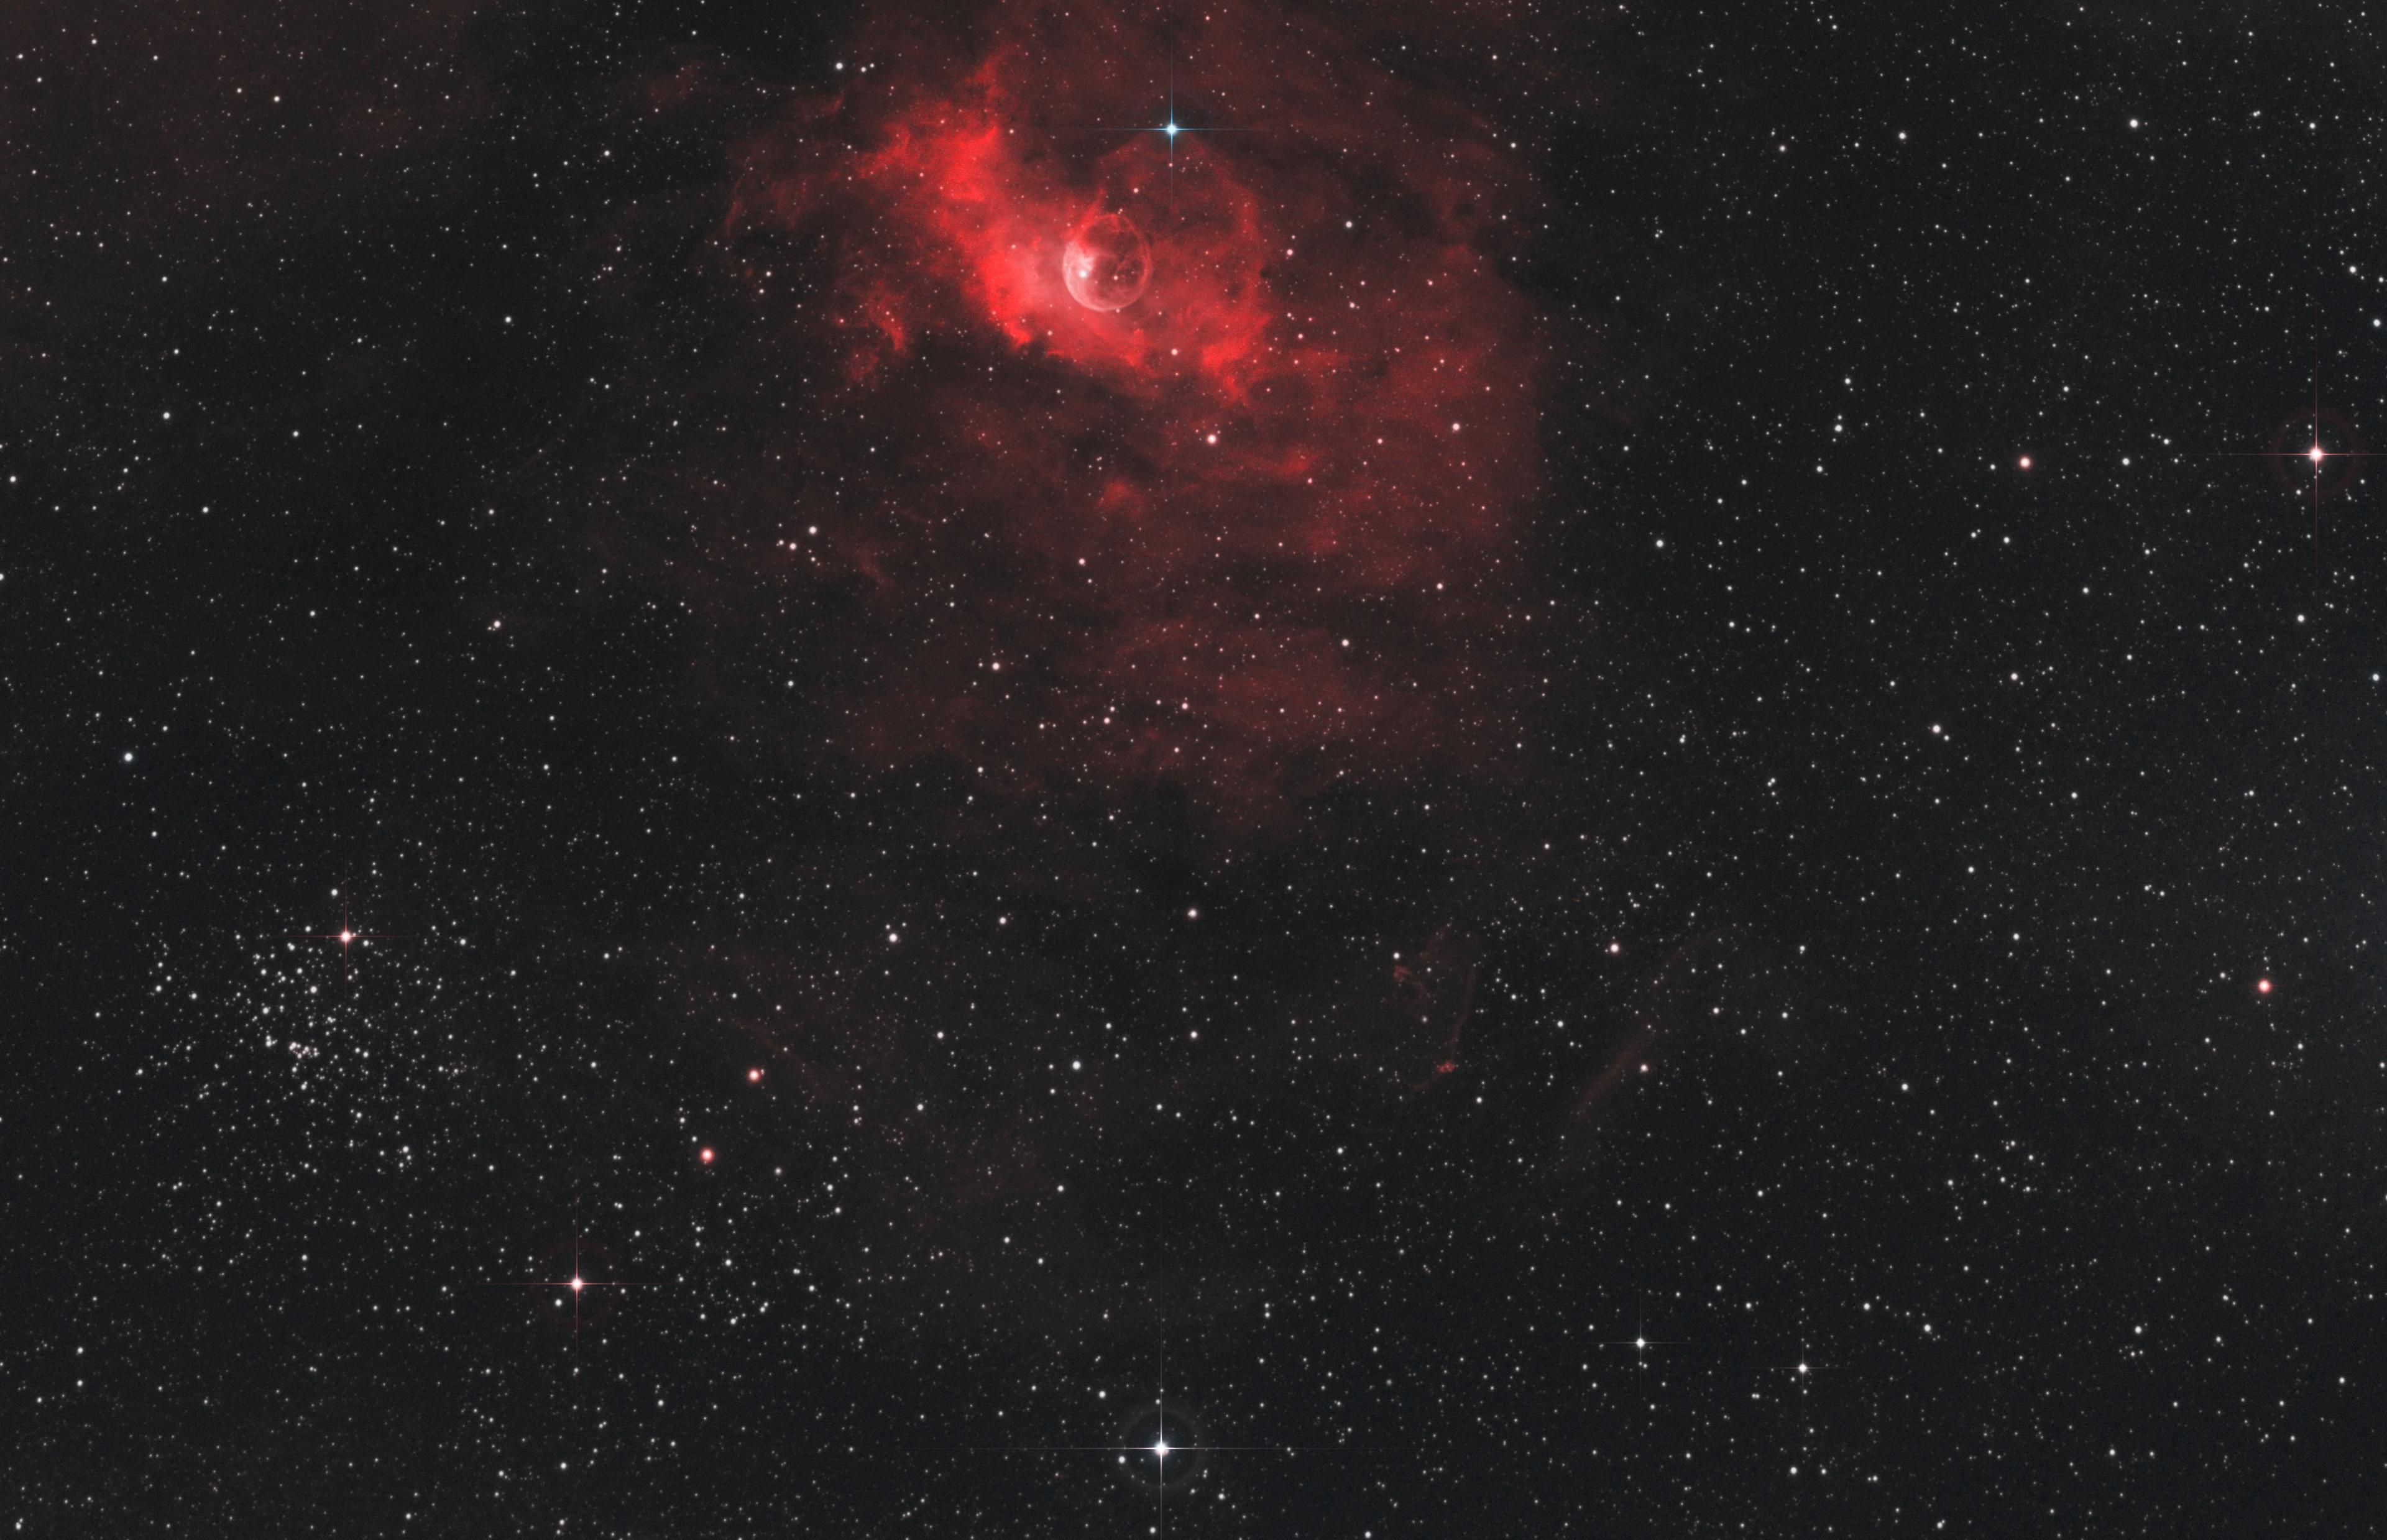 NGC7635_50x180sH_20x180sO6nm.jpg